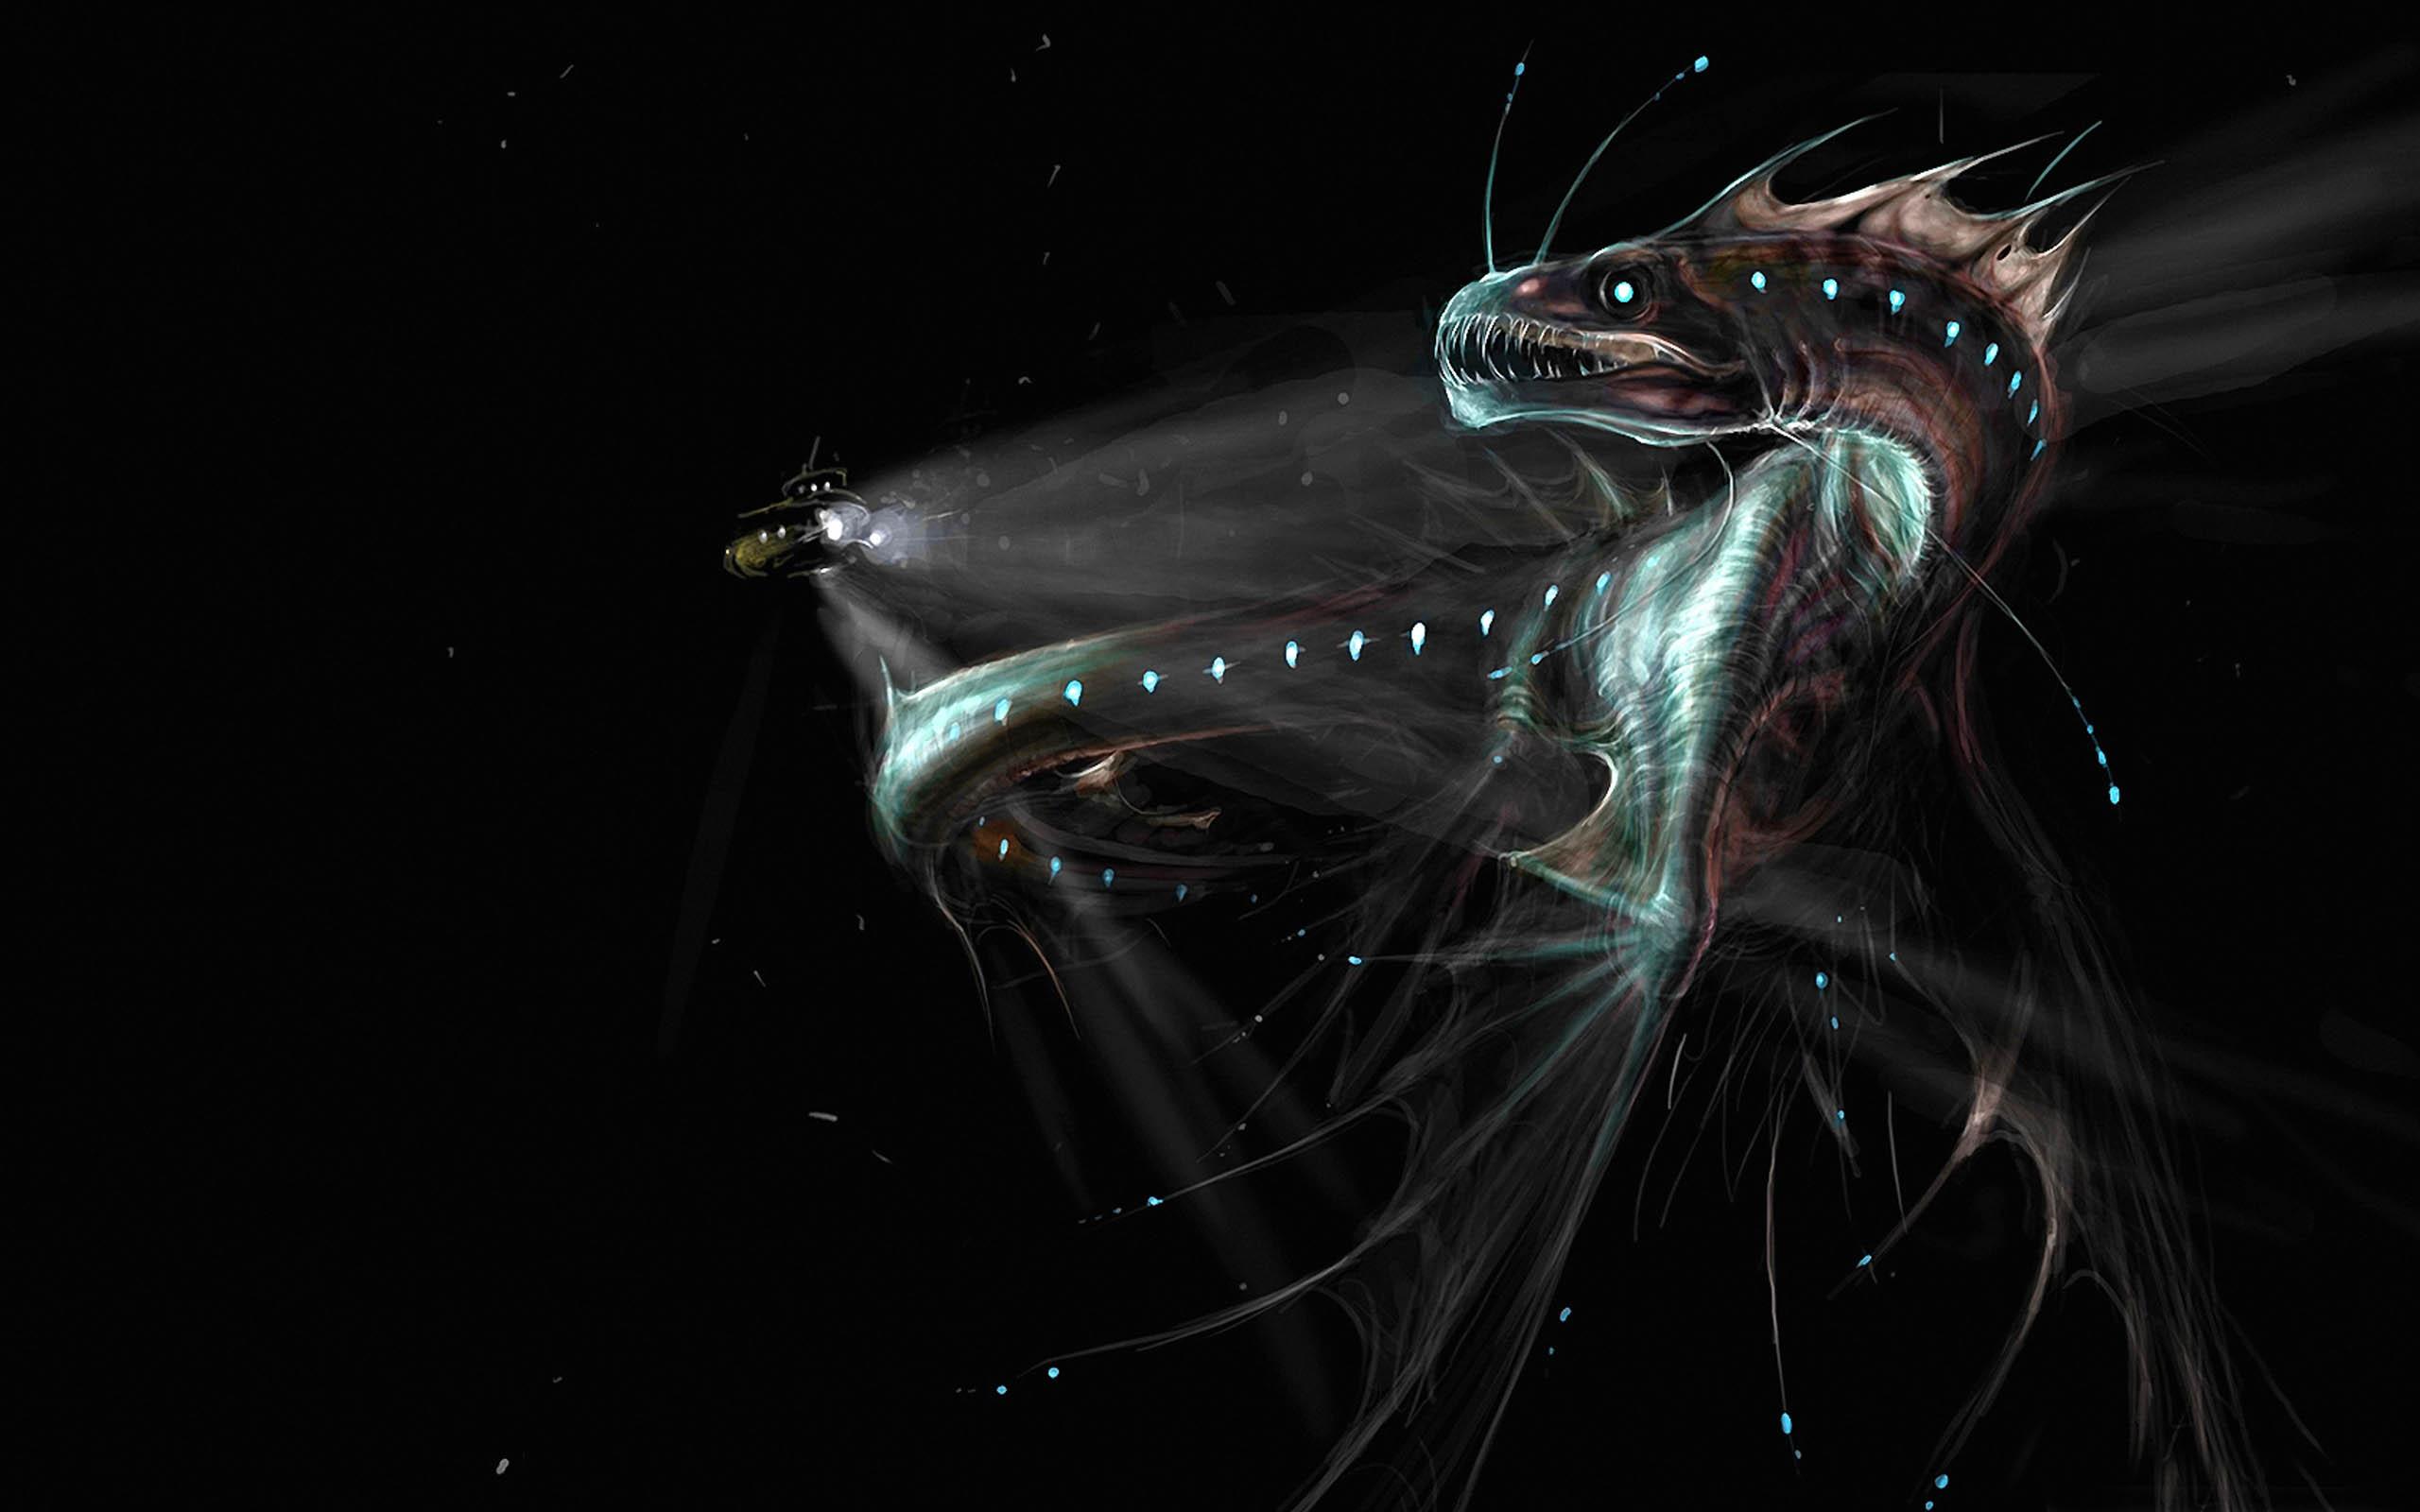 Giant sea monsters art - photo#35